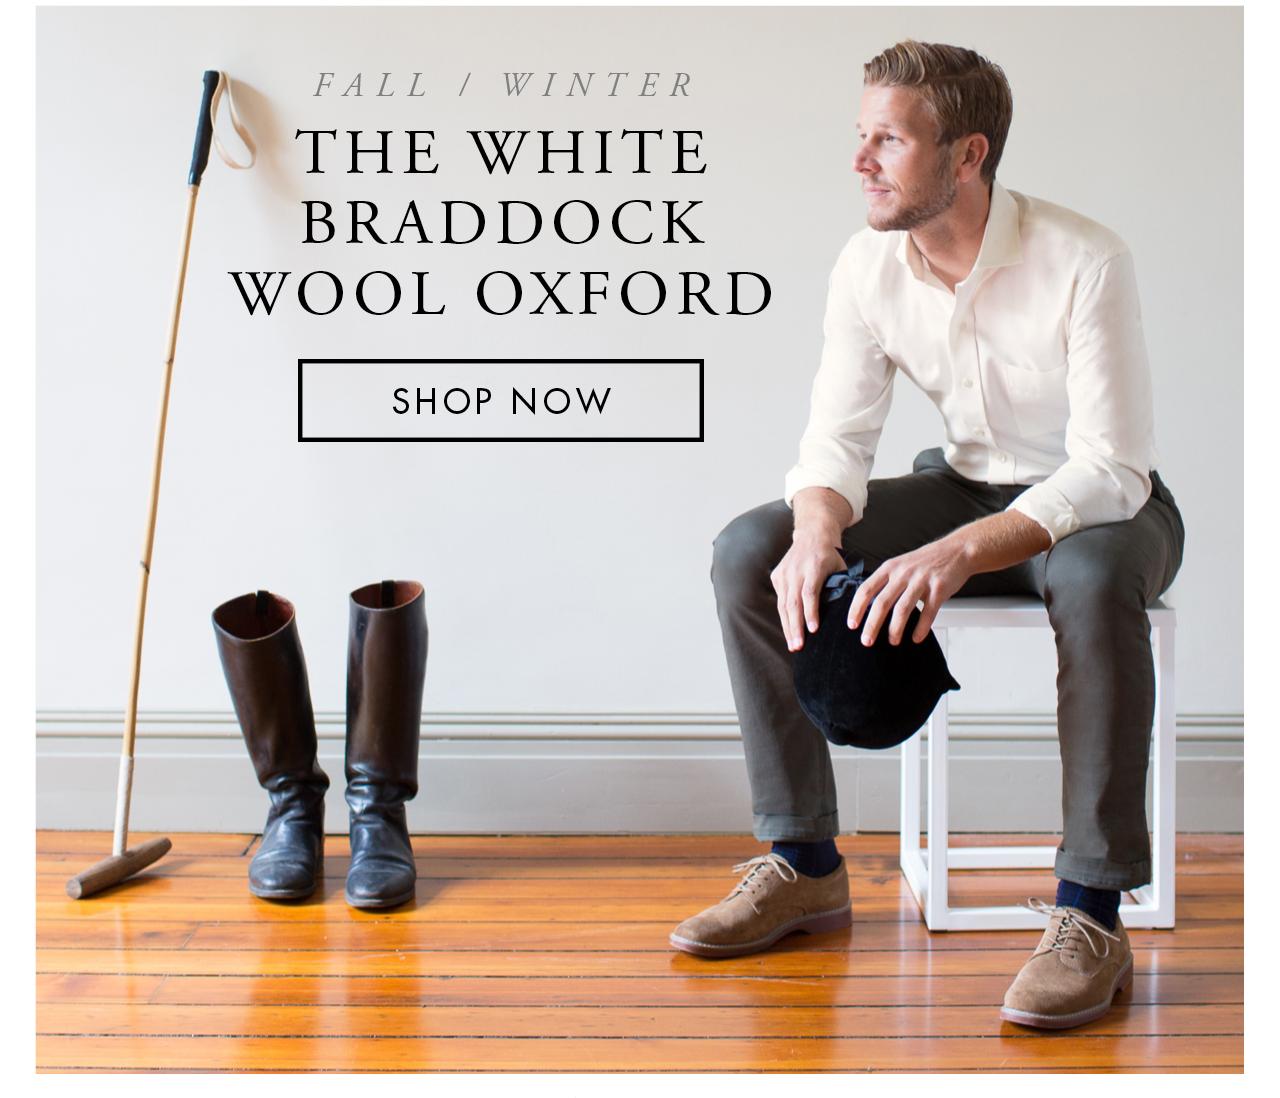 The White Braddock Wool Oxford